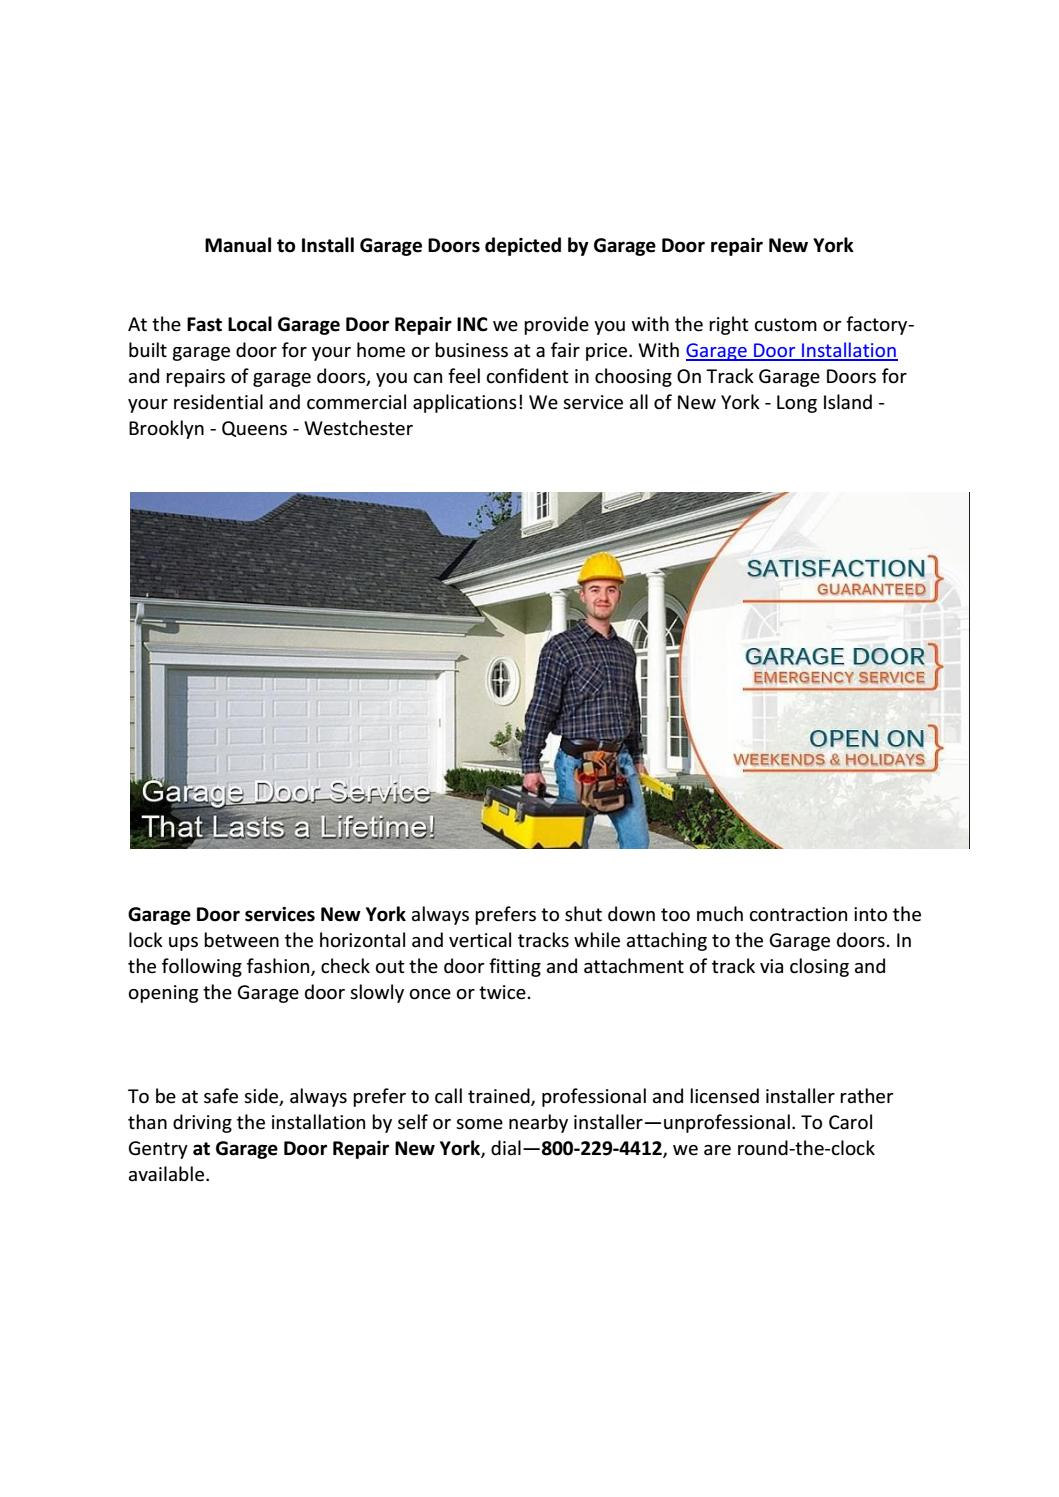 Best Garage Door Installation And Repair Service Company New York By